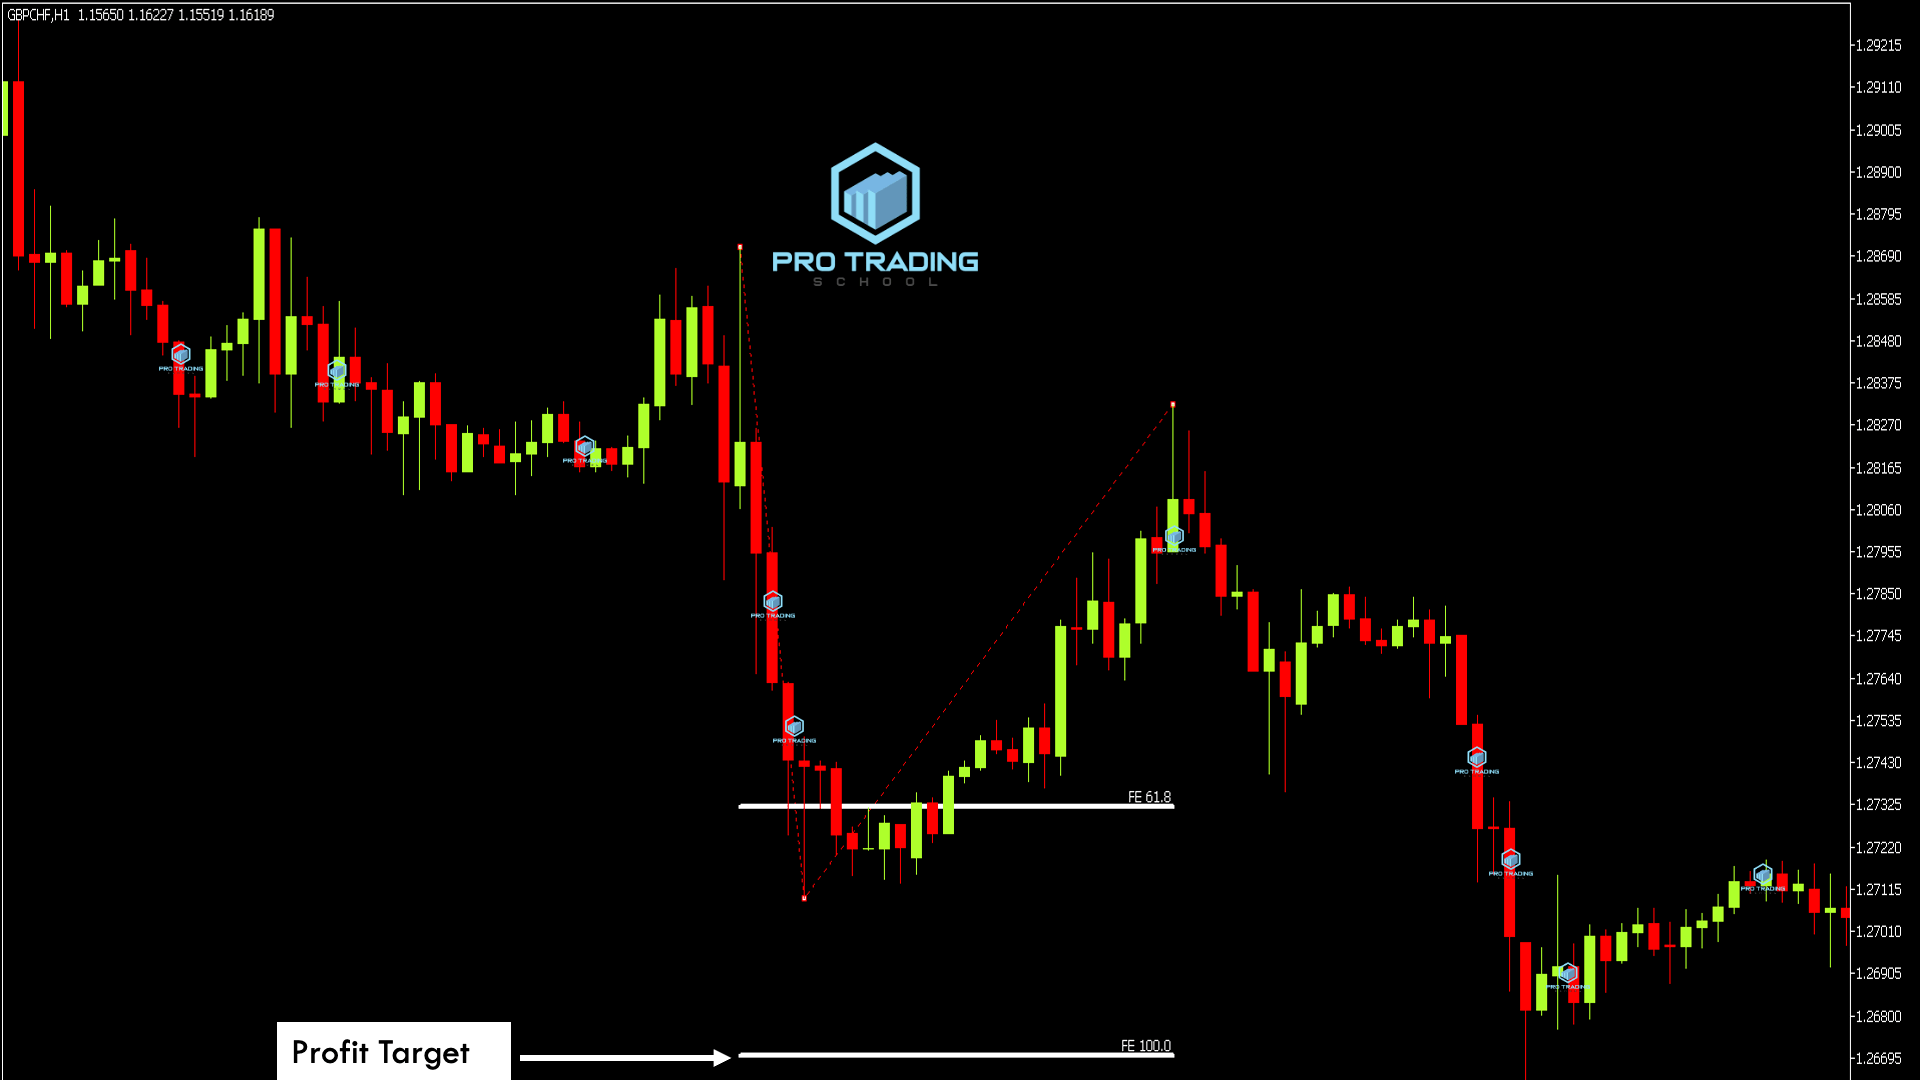 fibonnaci-levels-in-trending-markets